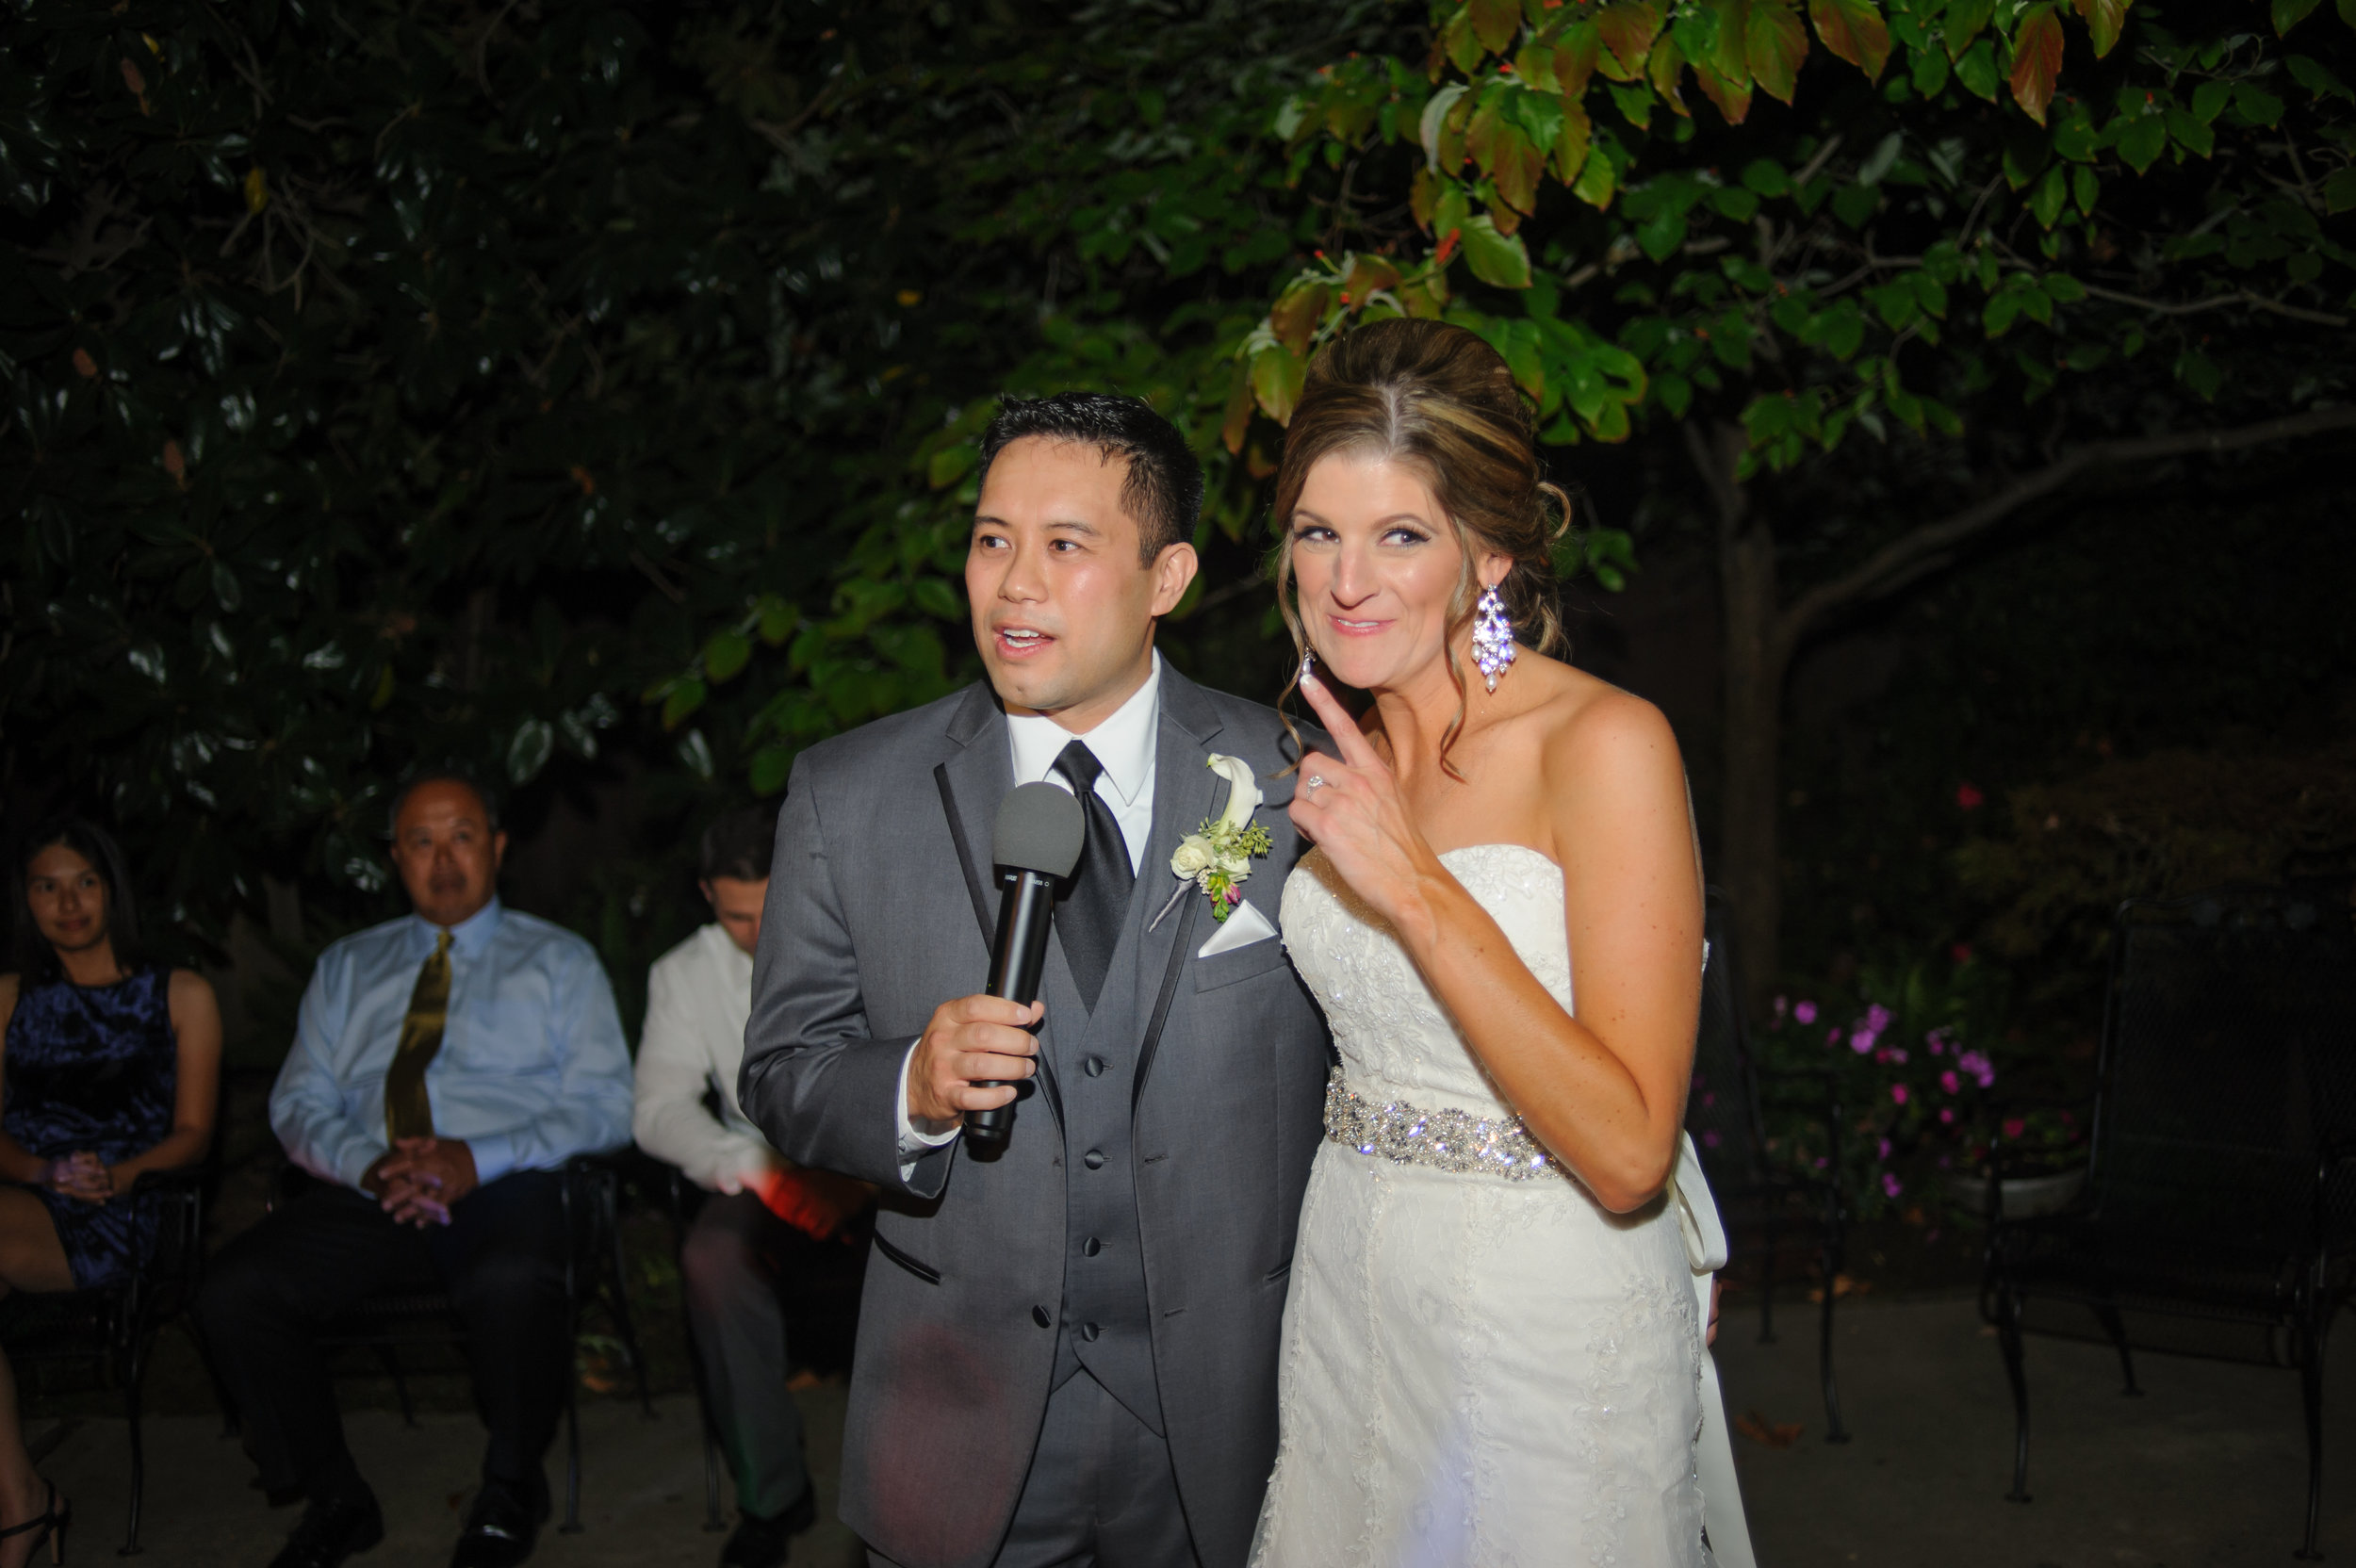 susan-brad-037-sacramento-wedding-photographer-katherine-nicole-photography.JPG